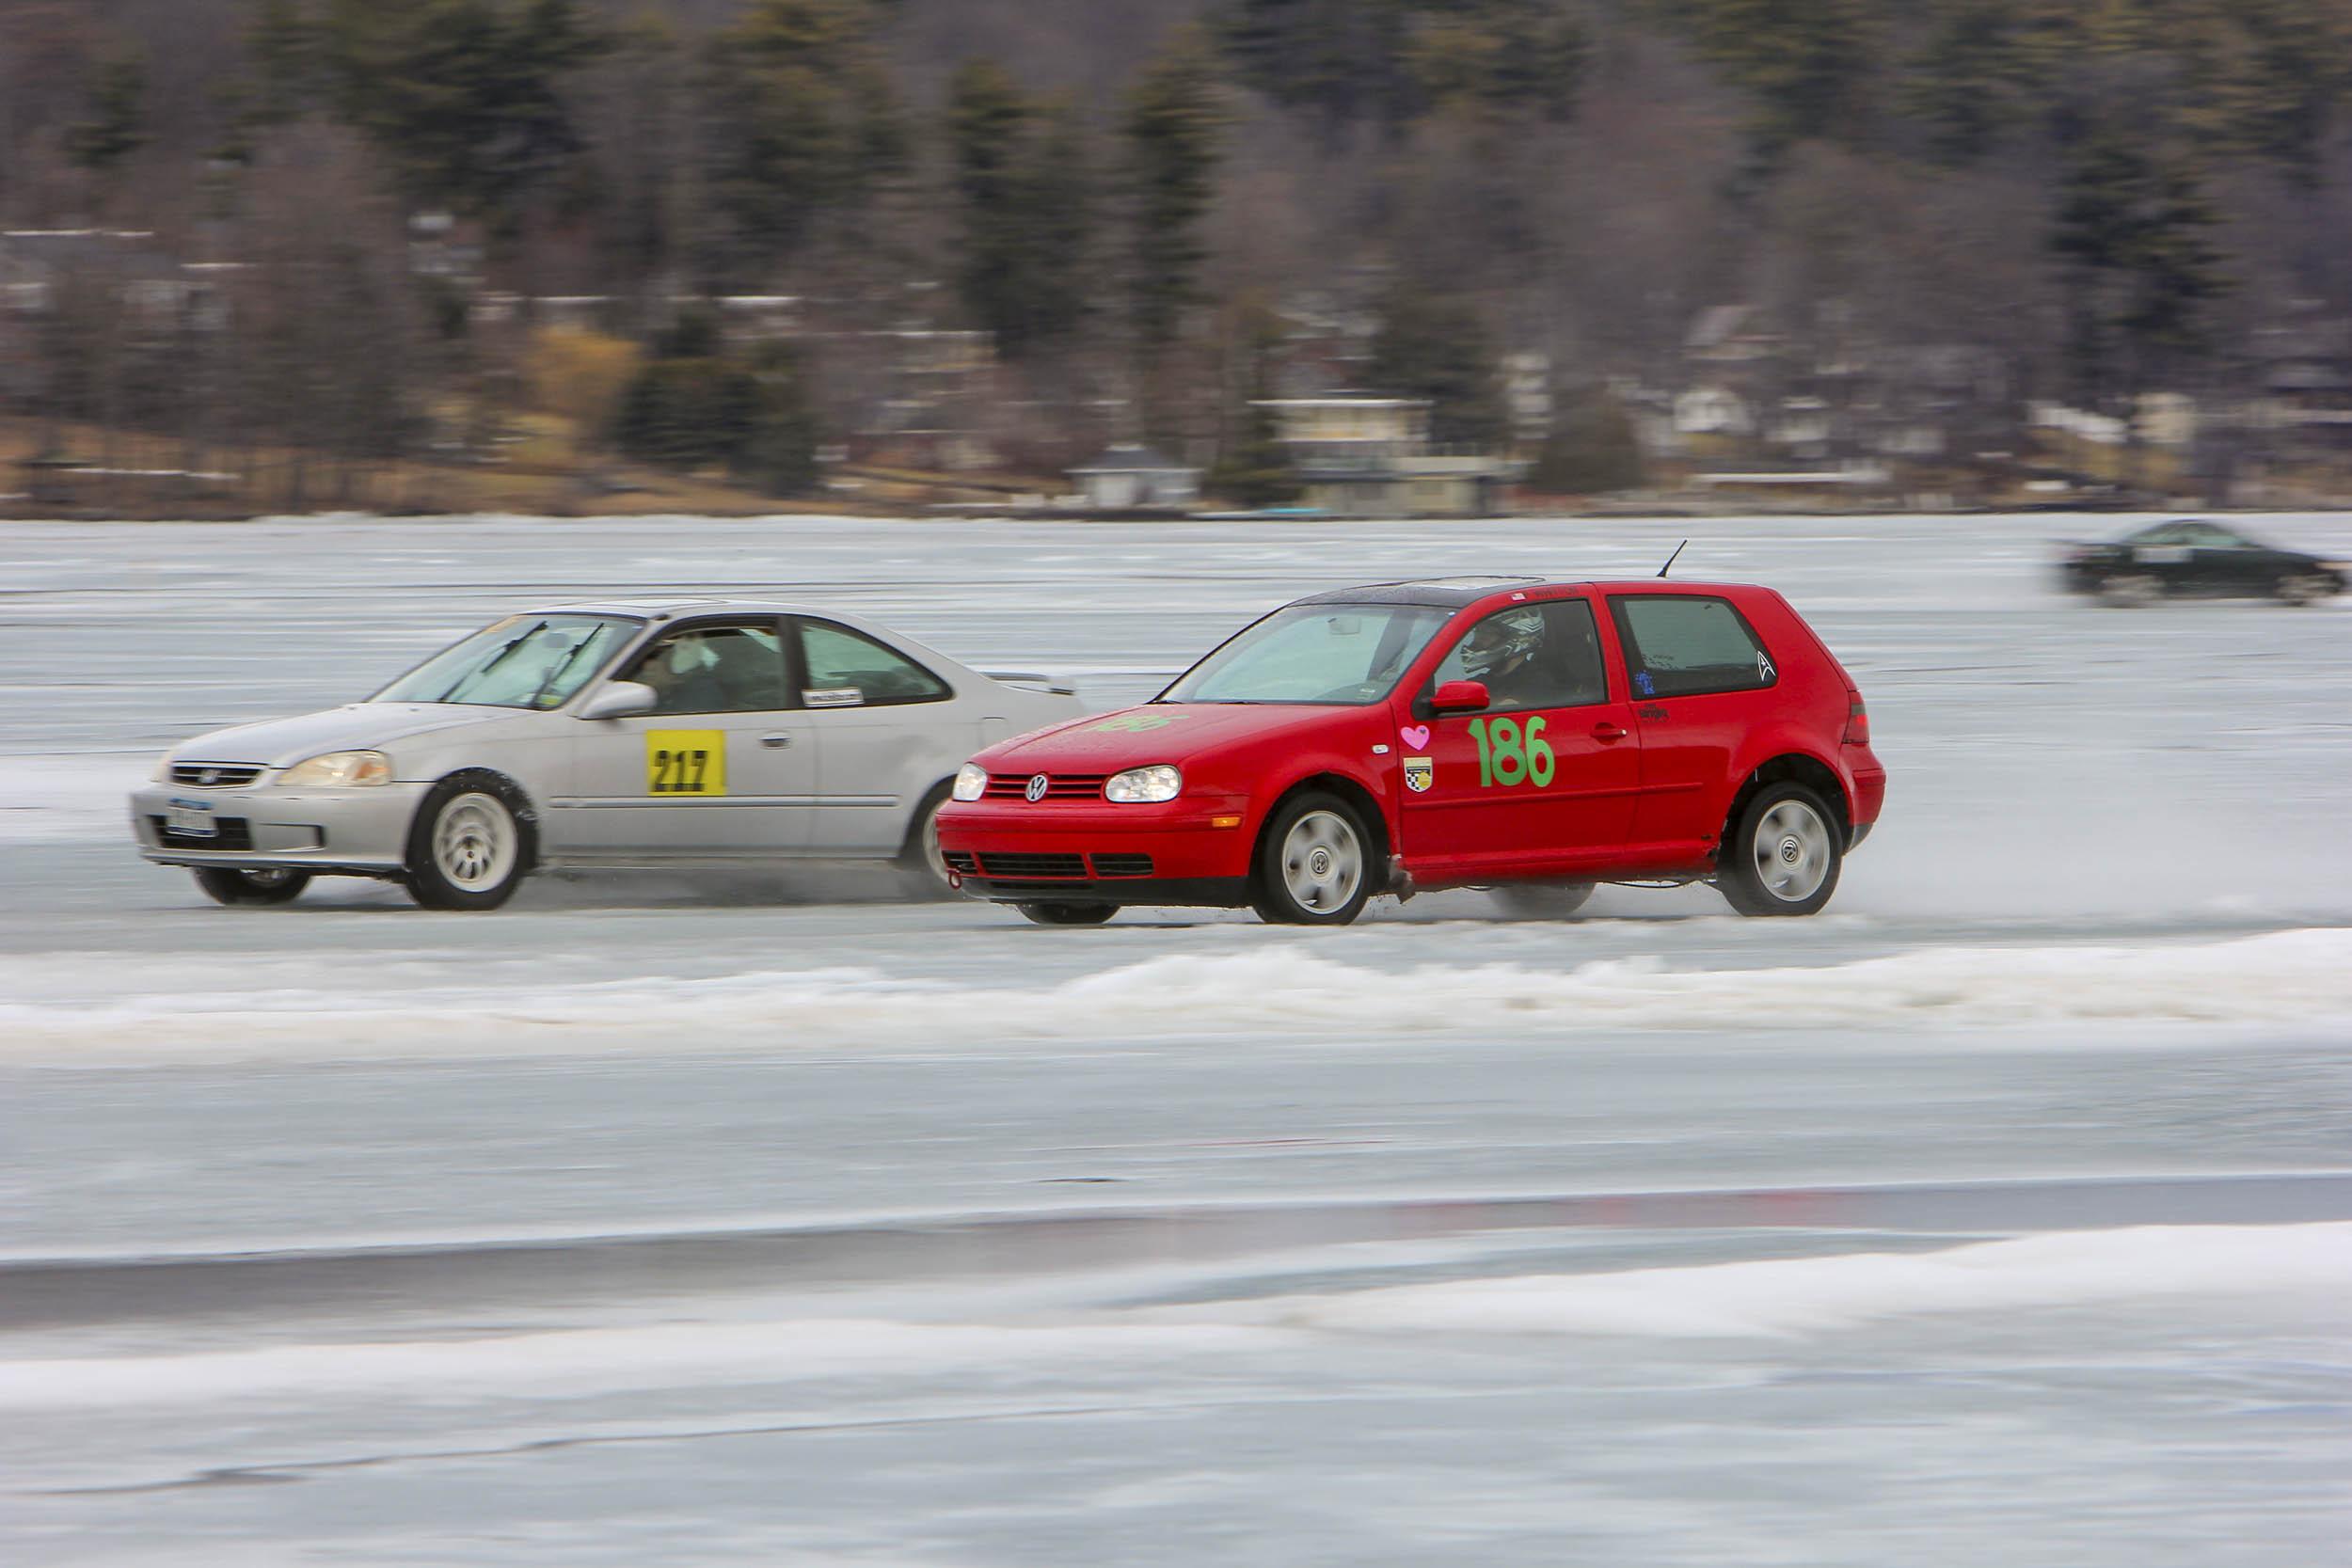 drag racing on ice